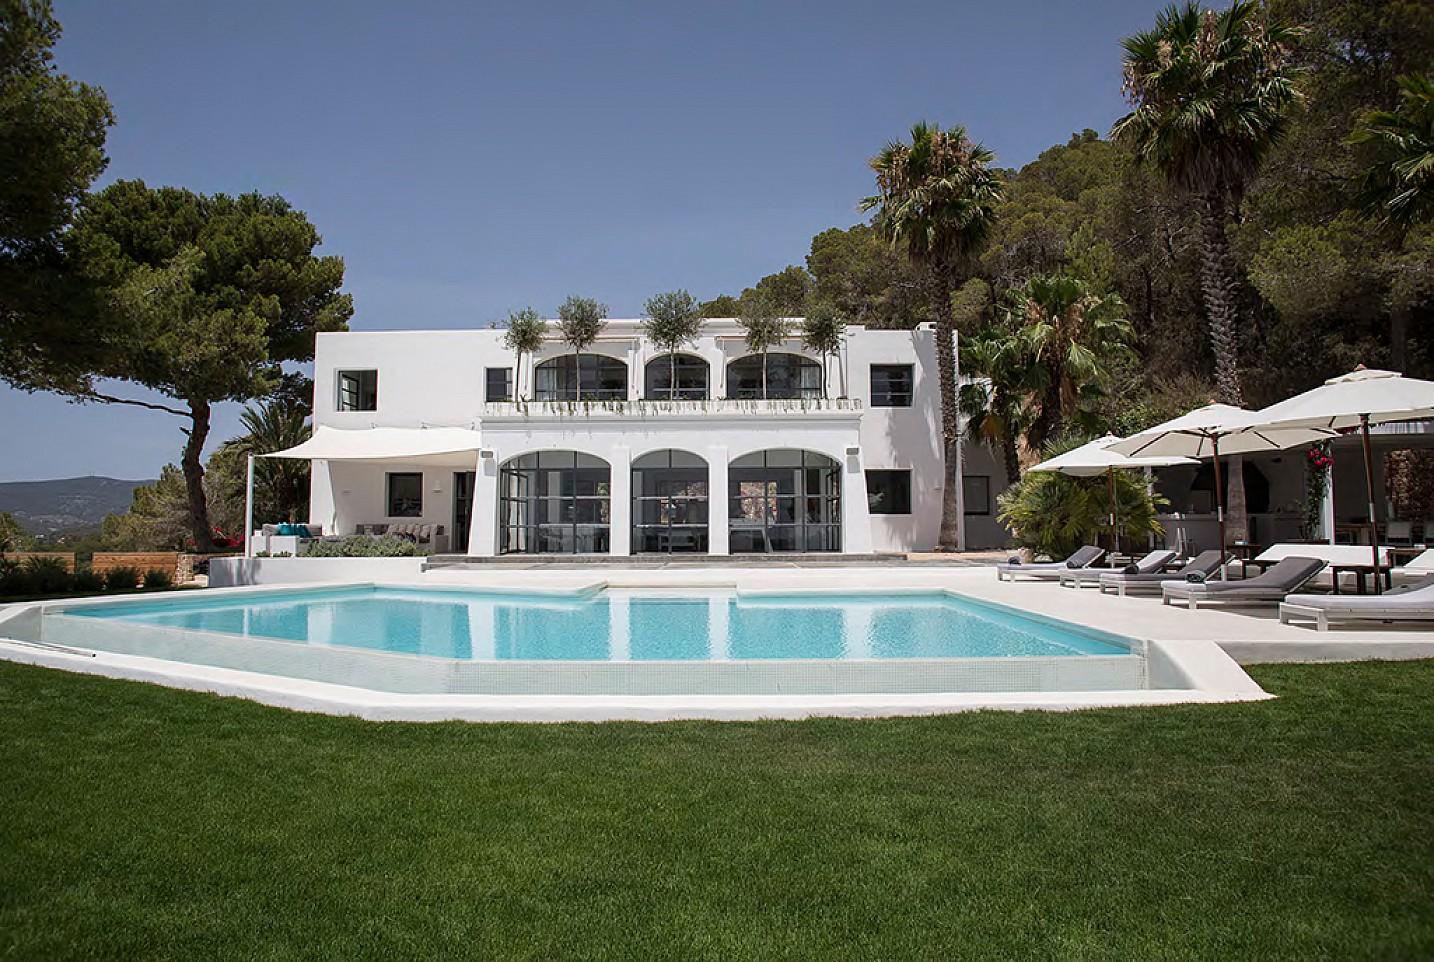 Impresionante villa de lujo en alquiler en ibiza oi realtor - Apartamentos ibiza alquiler ...